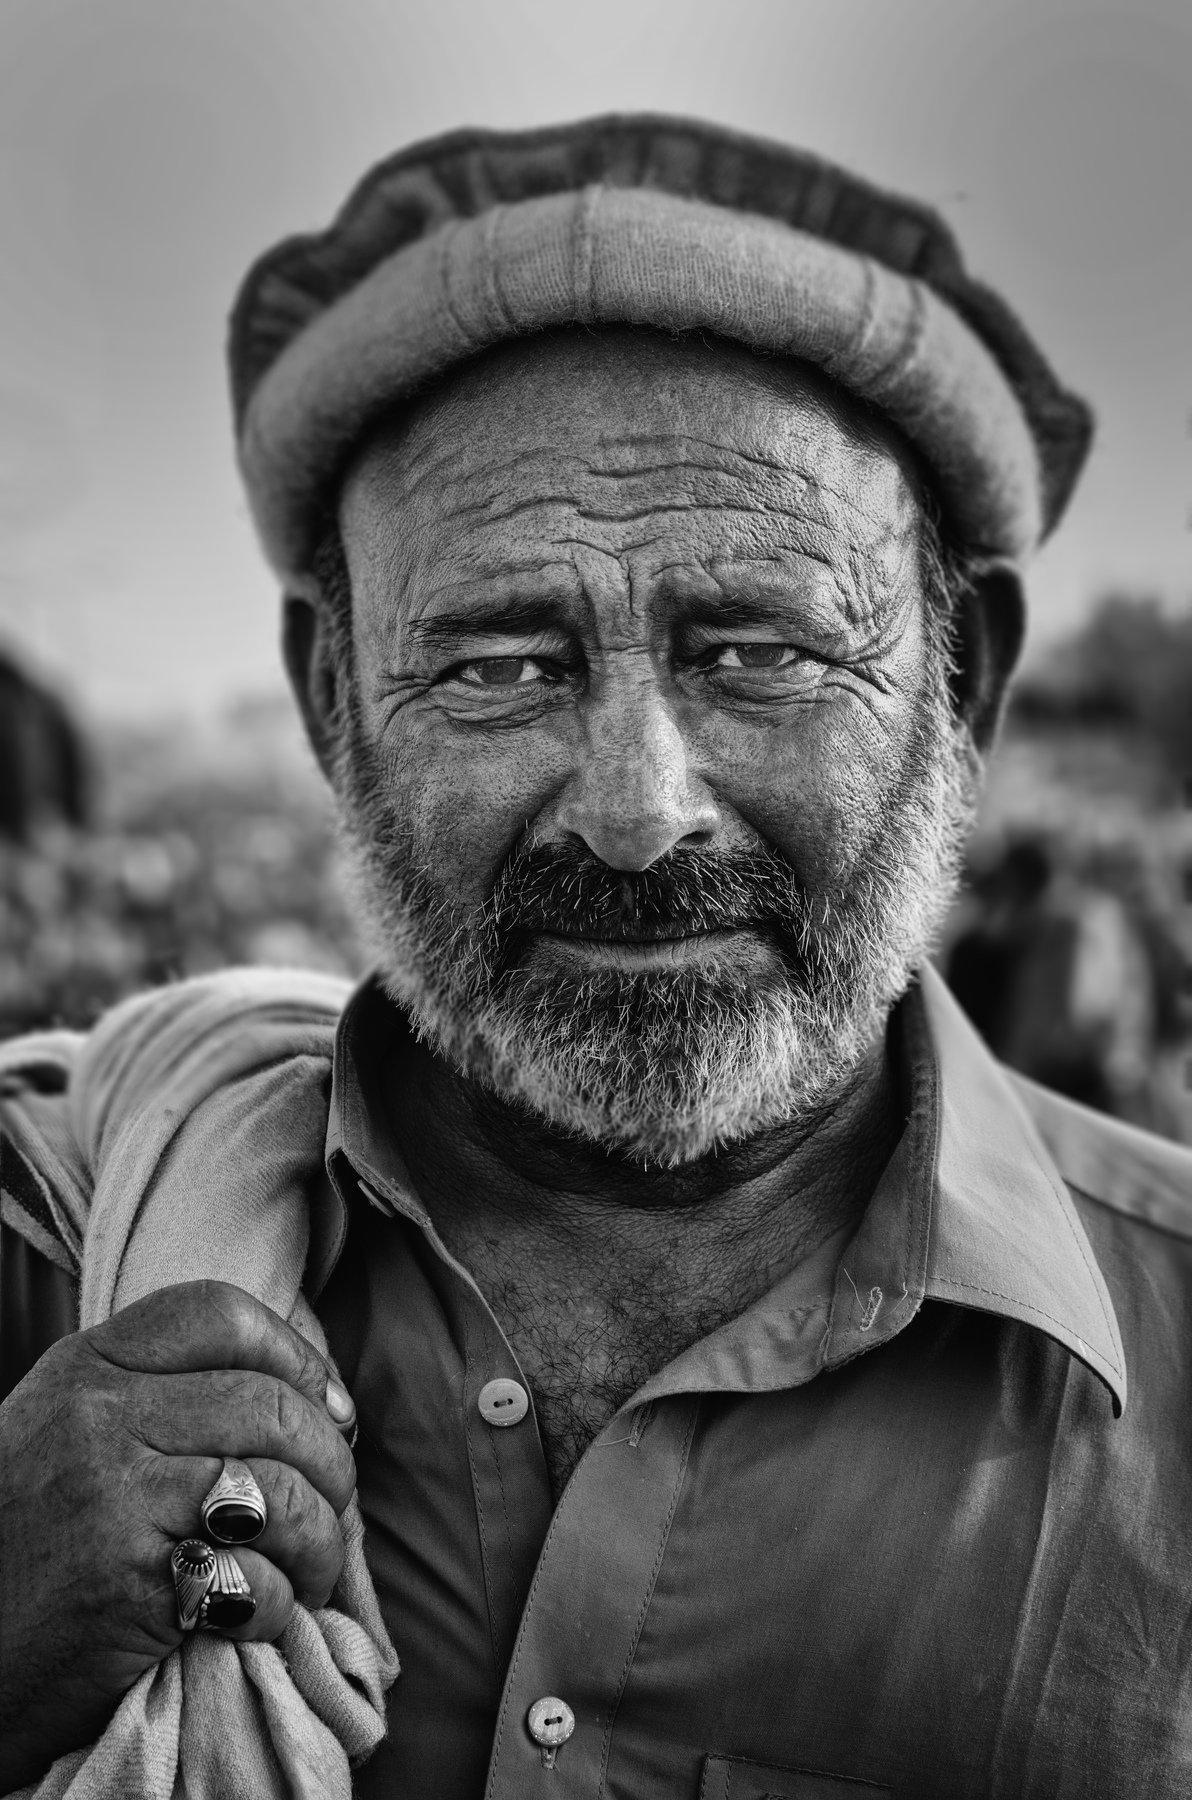 #iraq, #b&w, #nikon, kadhim ali sabih